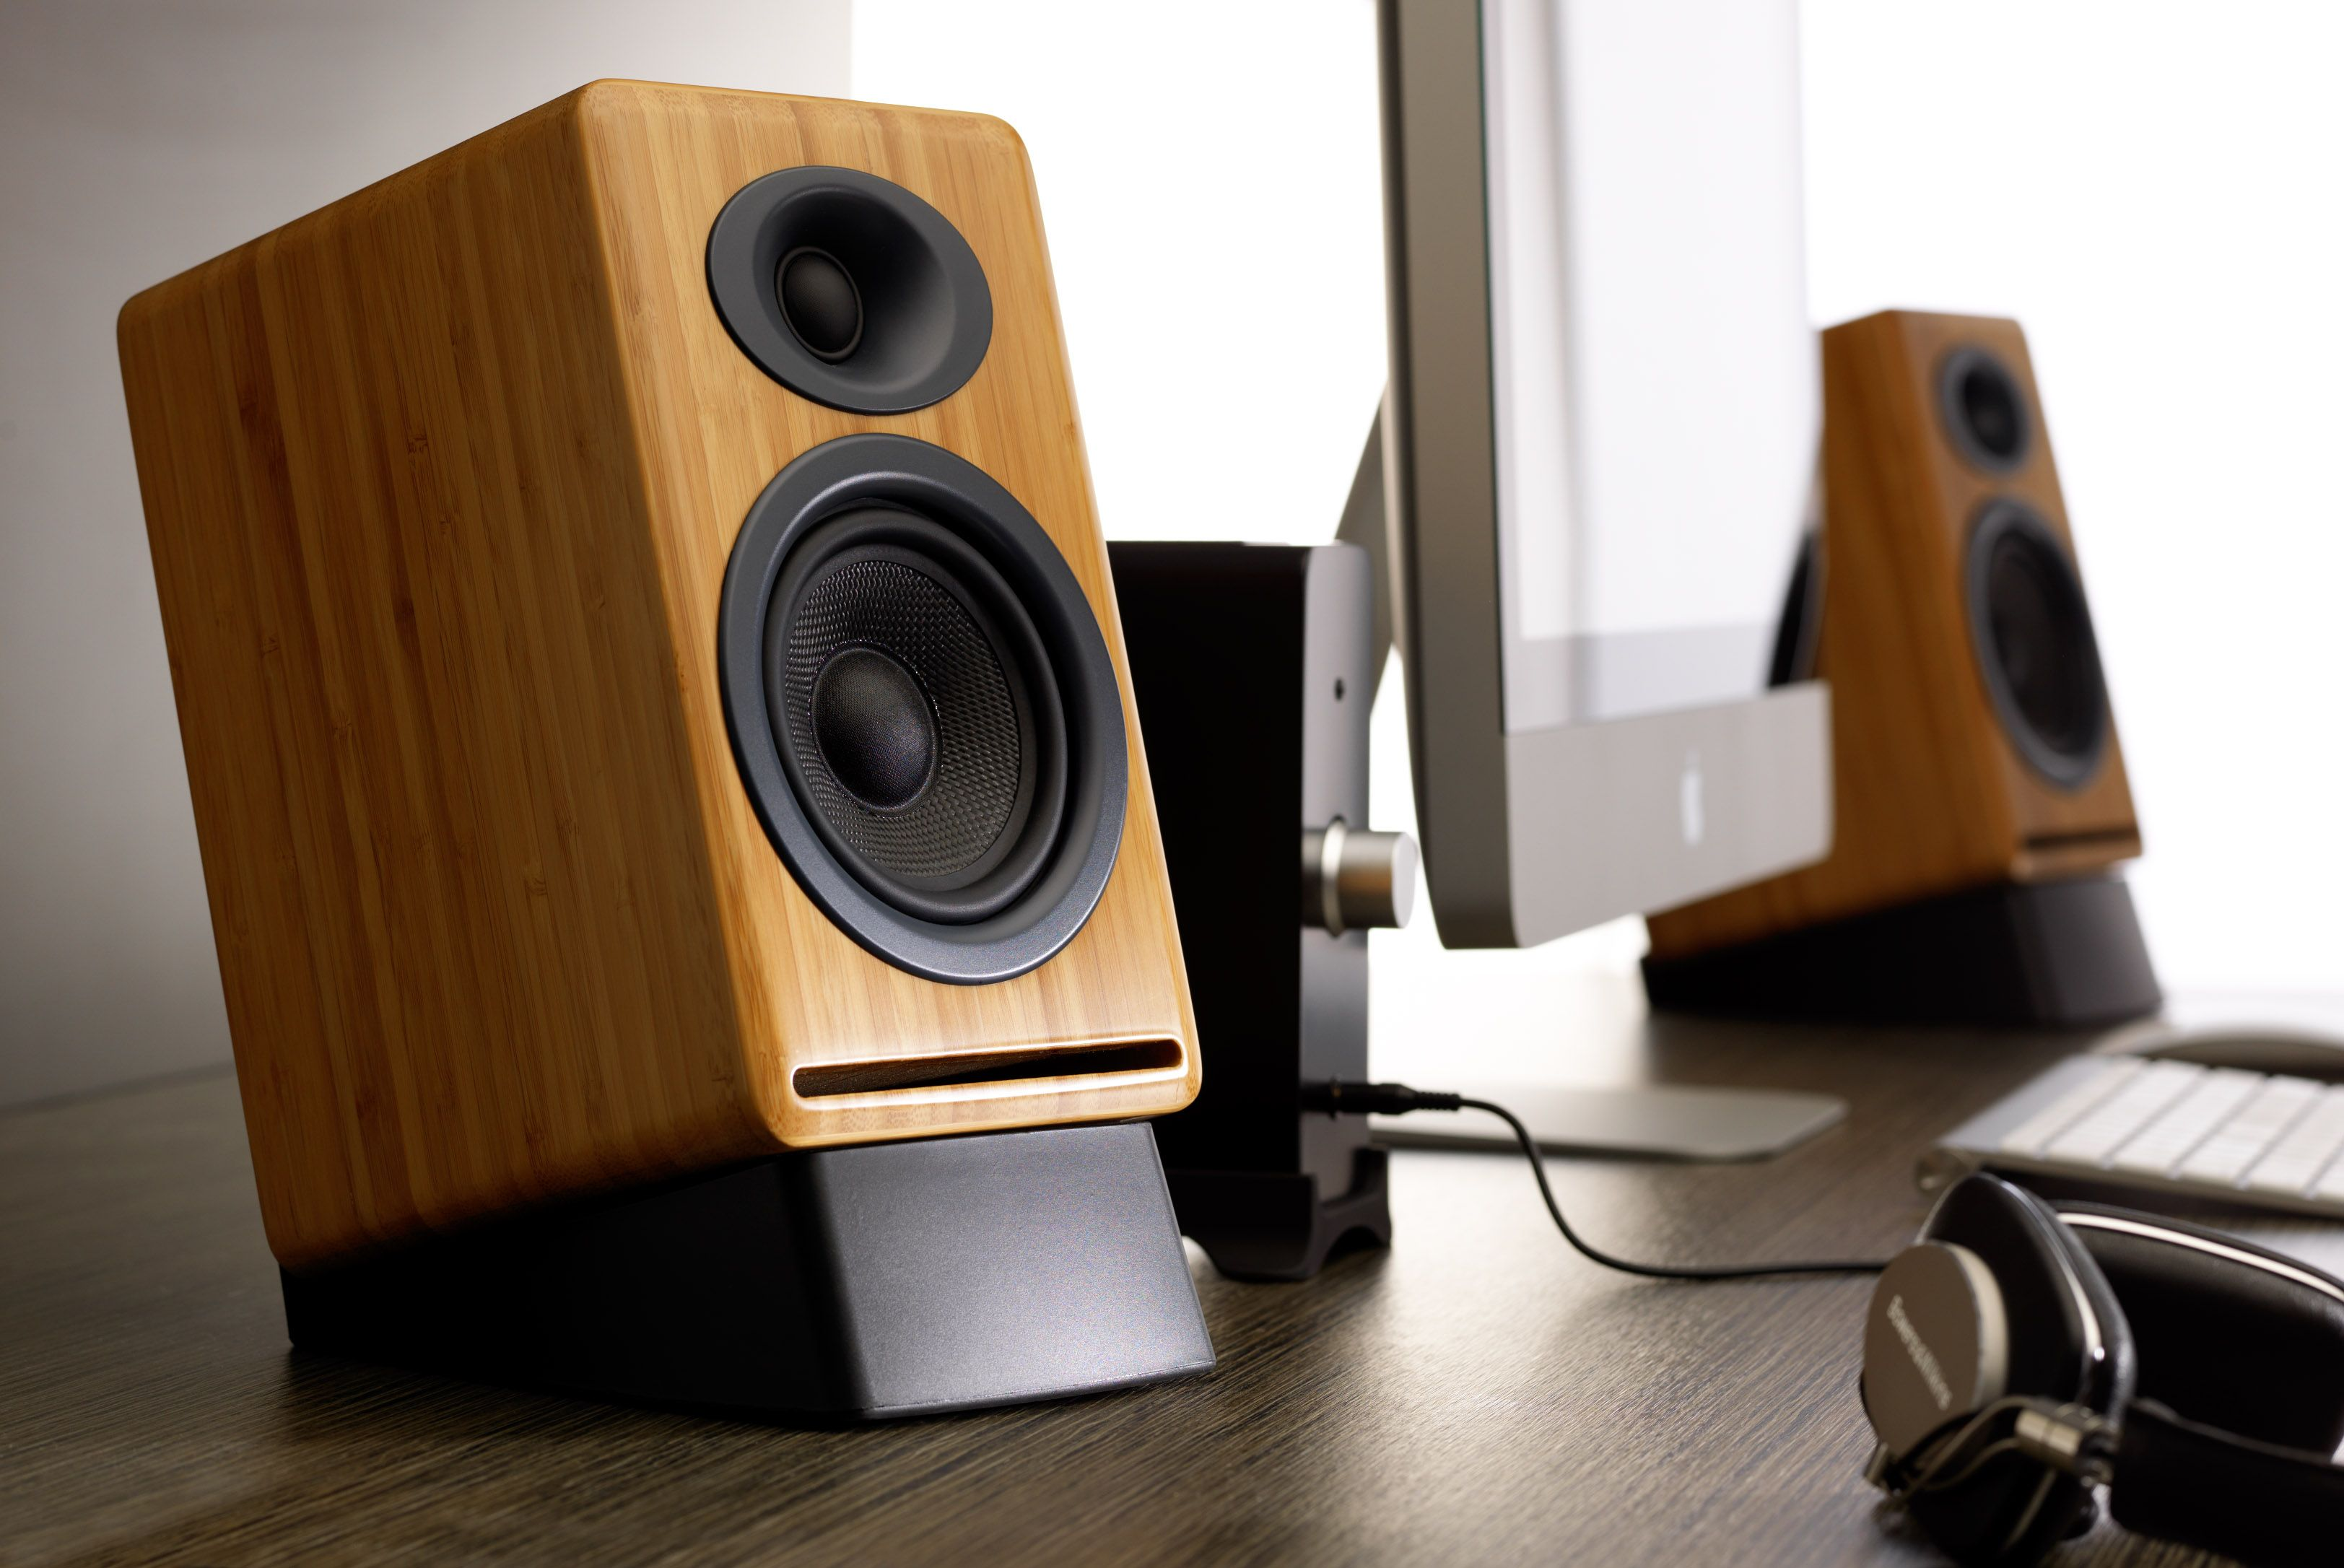 ds2 desktop stand (pair) | audio | pinterest | audioengine p4